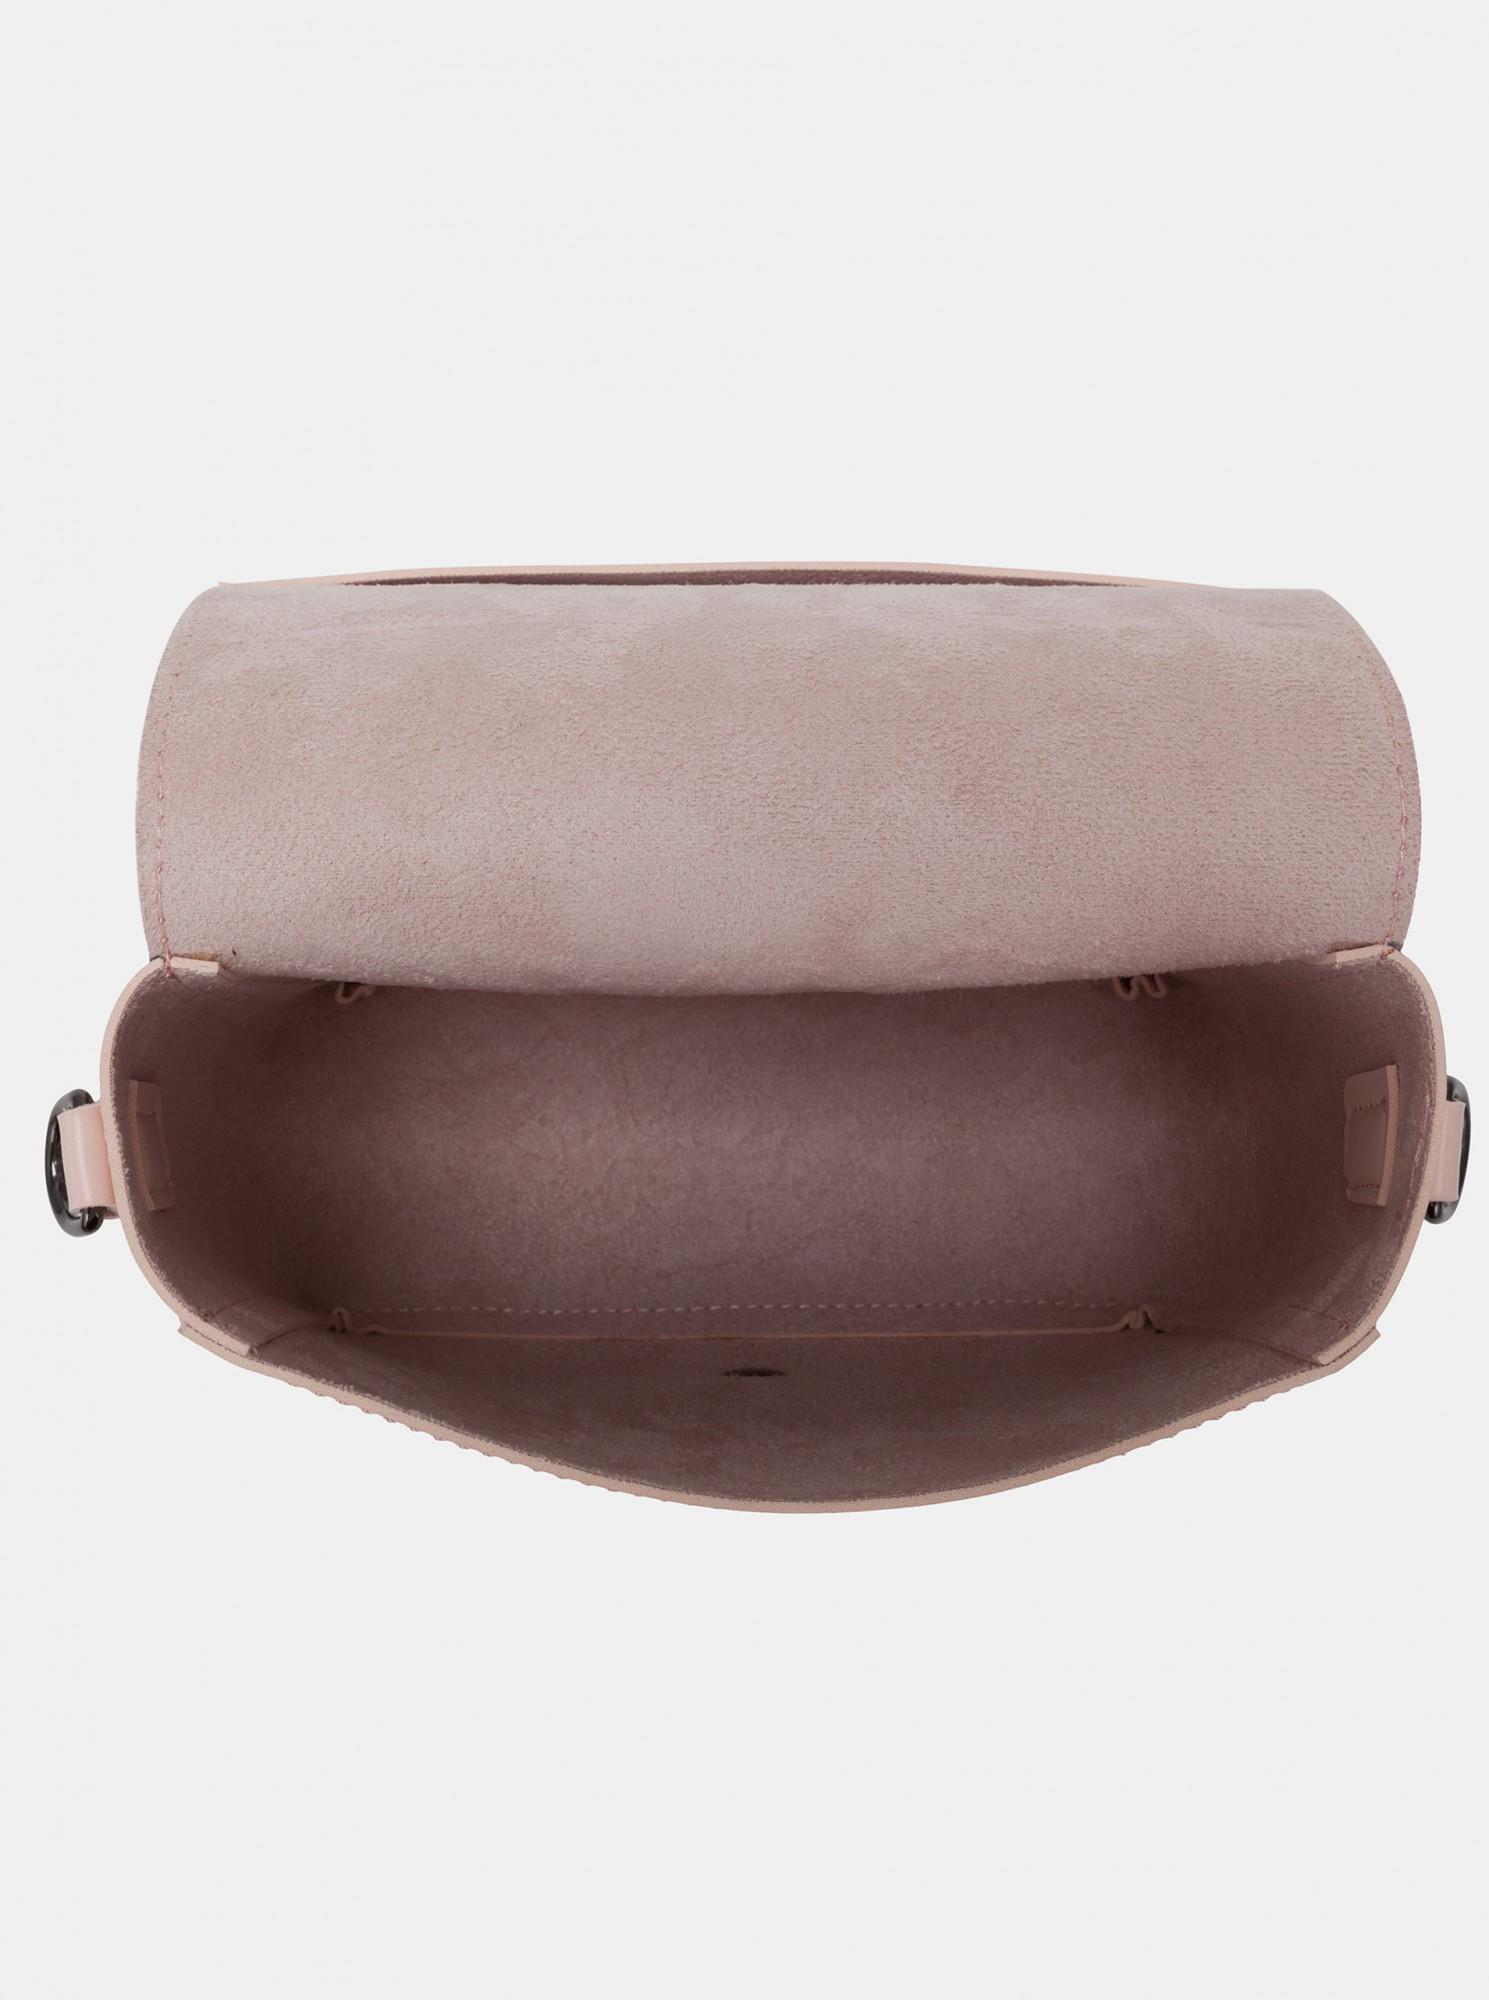 Claudia Canova pink crossbody handbag